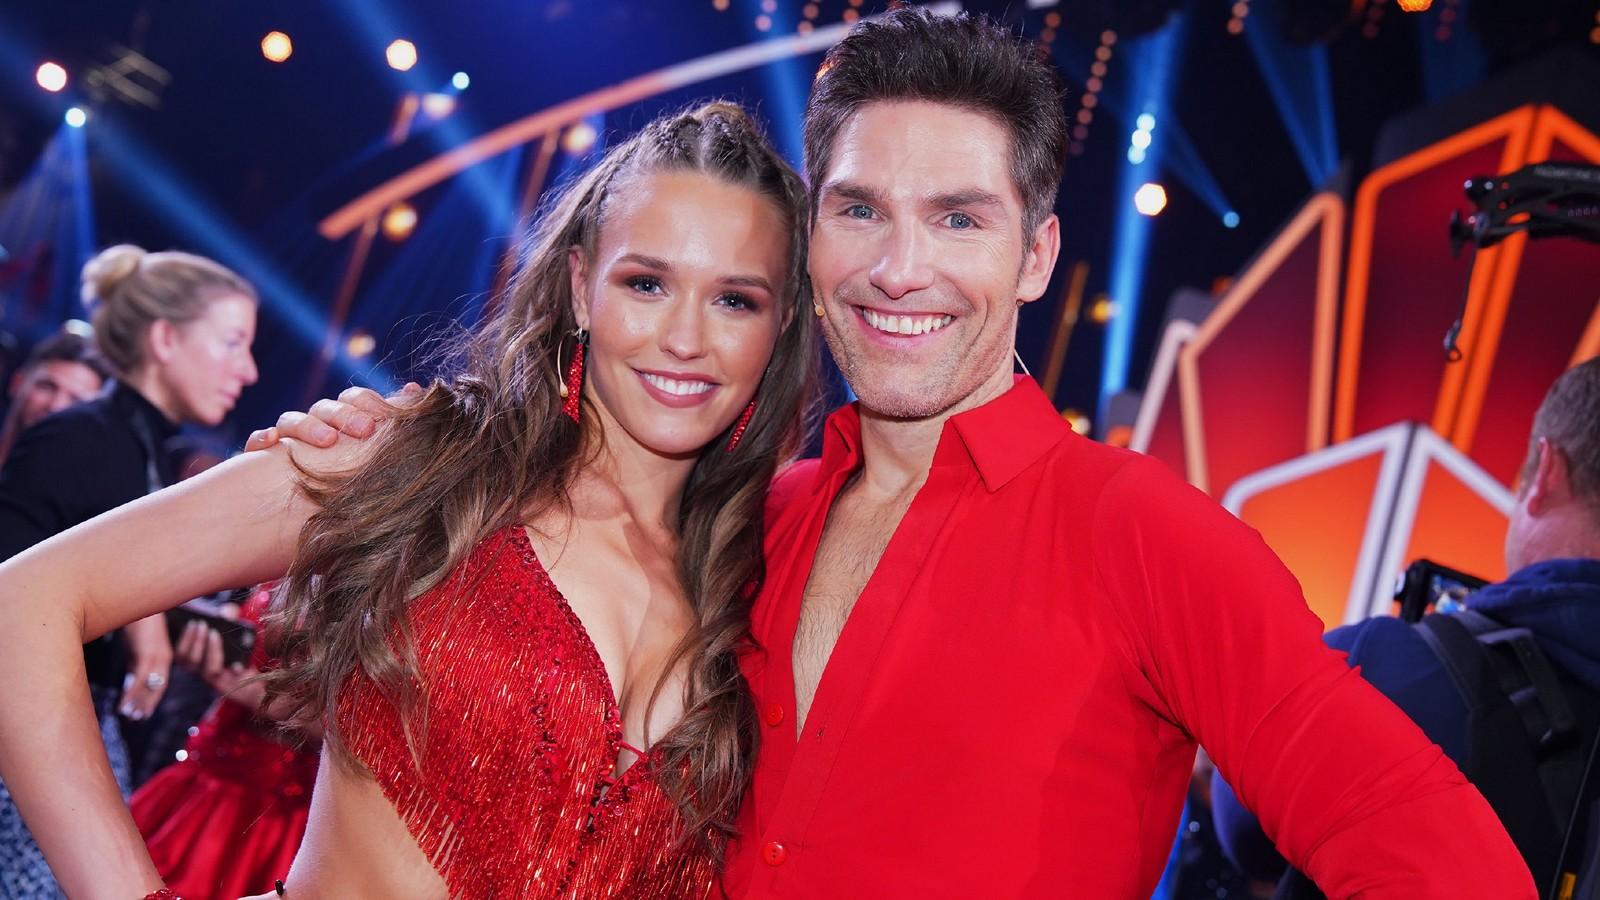 Laura Müller tanzt mit Christian Polanc